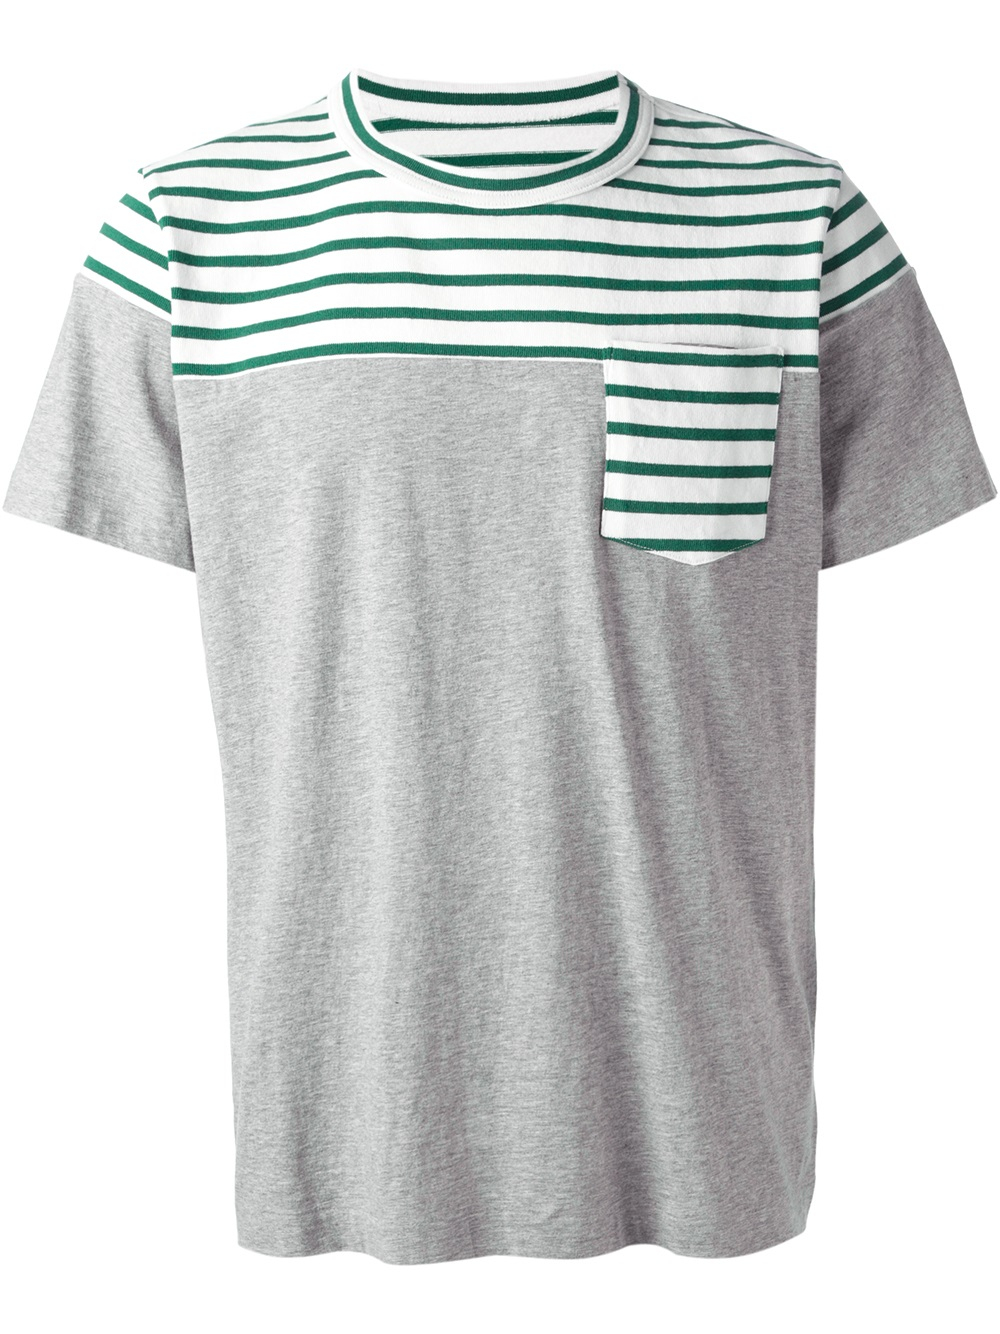 Sacai striped tshirt in gray for men grey lyst Grey striped t shirt